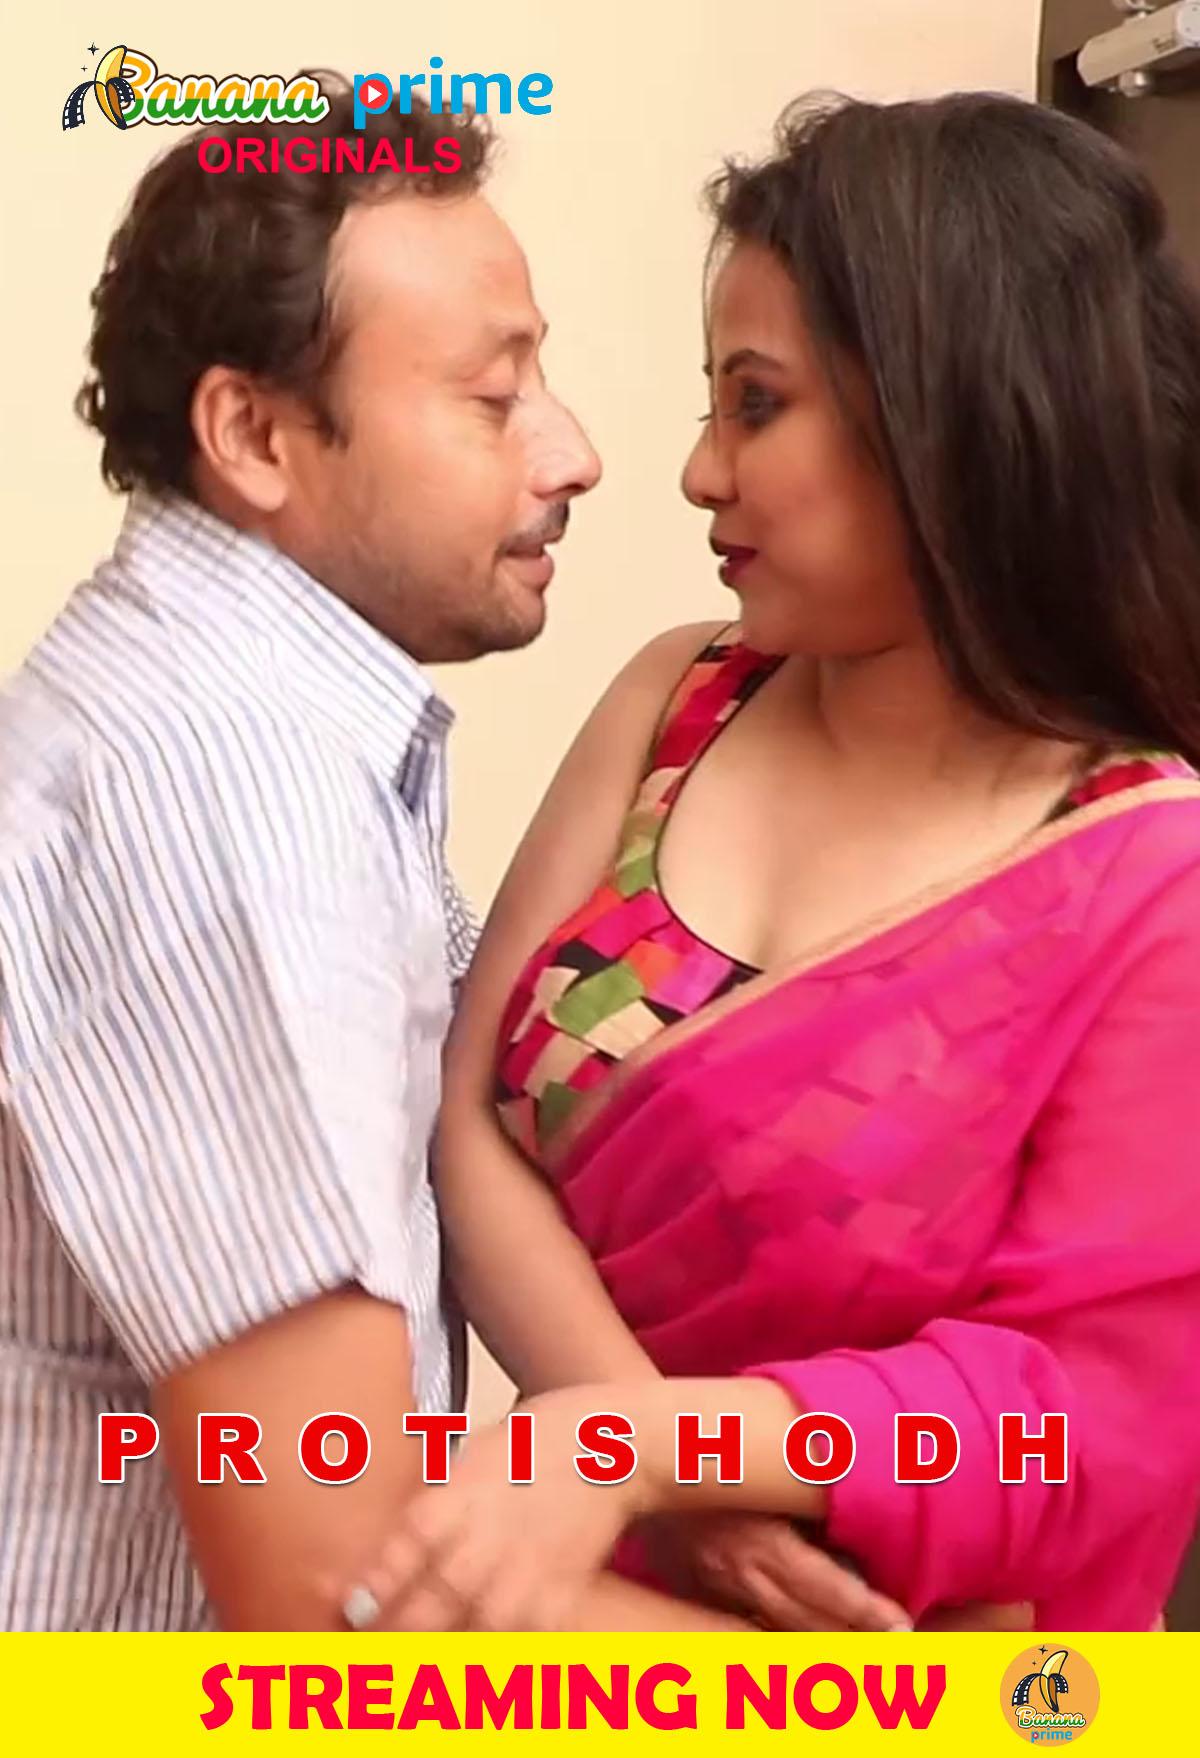 18+ Protishodh (2020) Bengali Bnana Prime Originals Adult Series